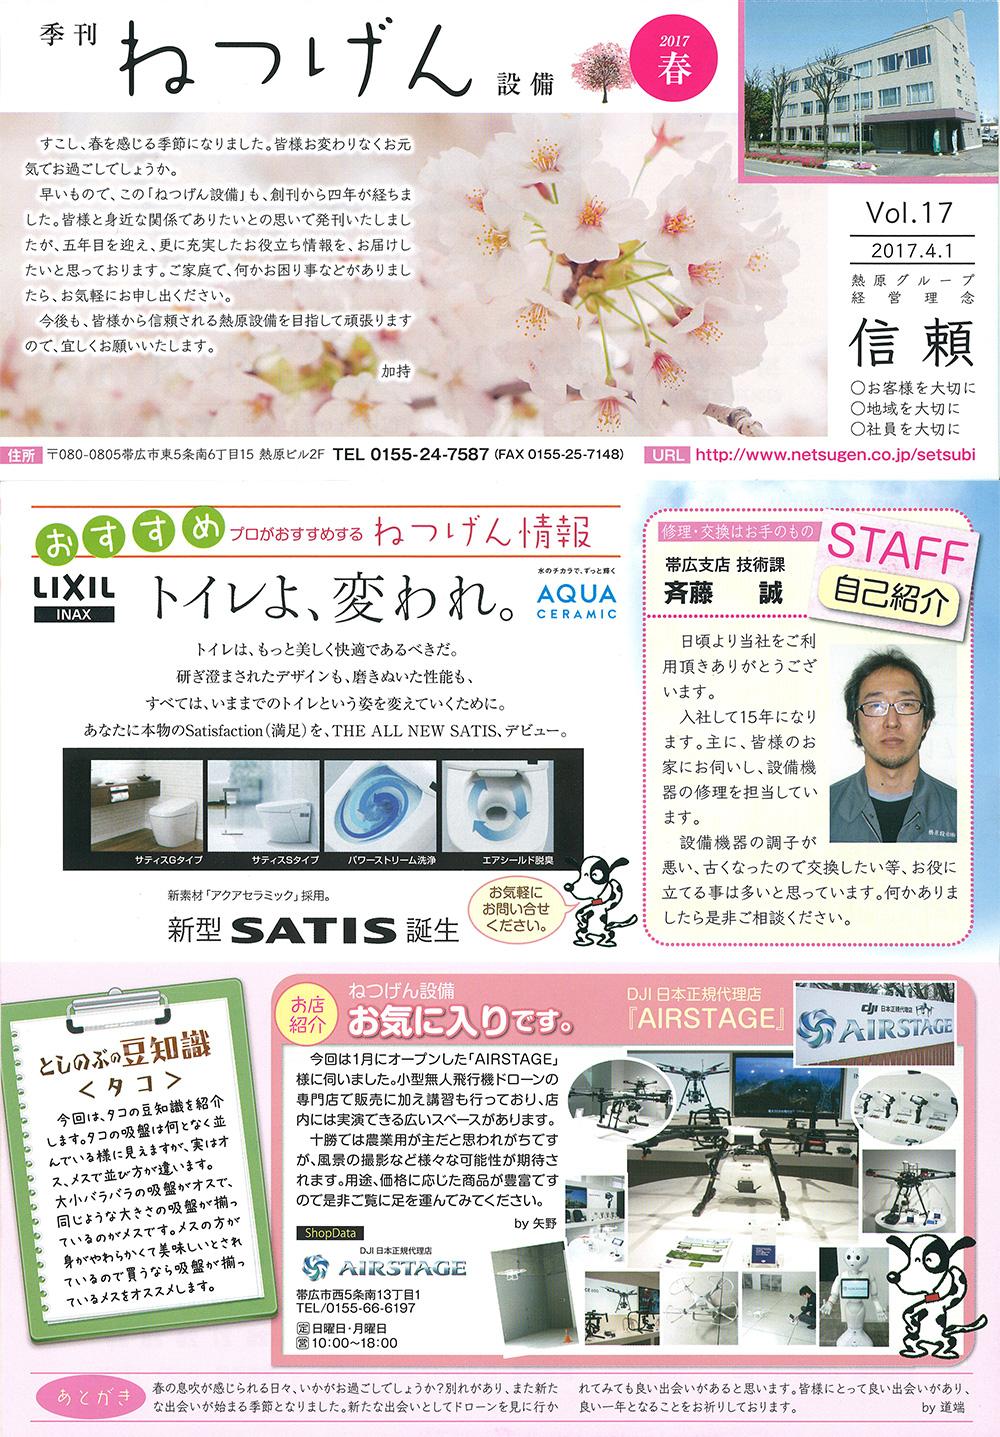 http://www.netsugen.co.jp/setsubi/information/images/170401kikan.jpg